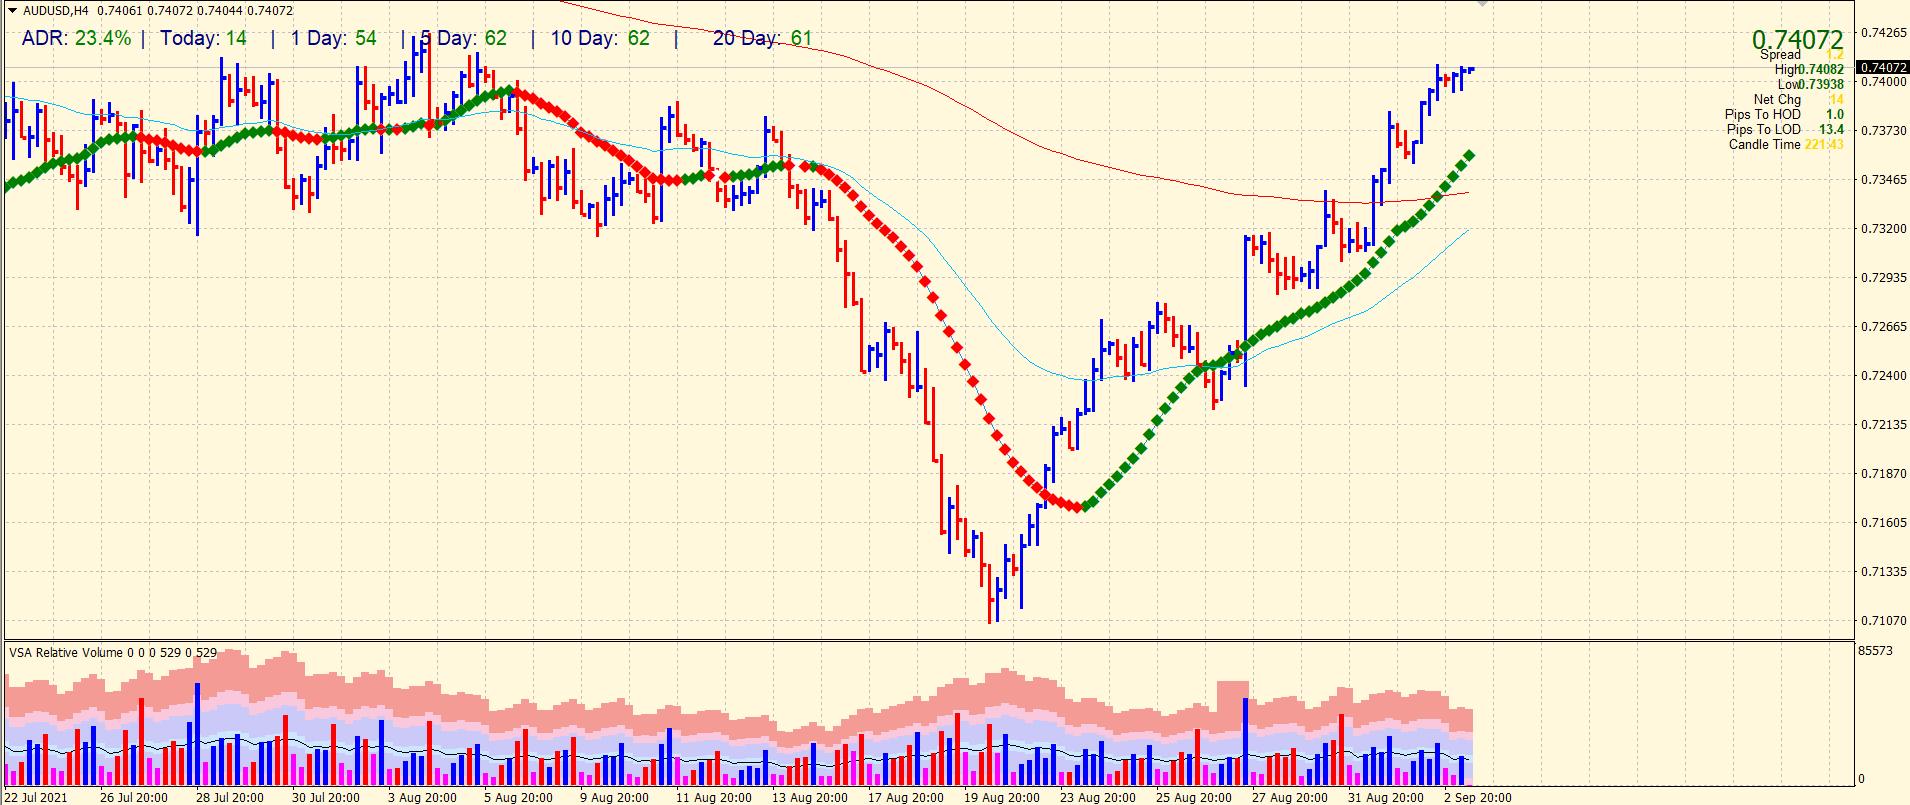 AUD/USD 4-hour chart analysis